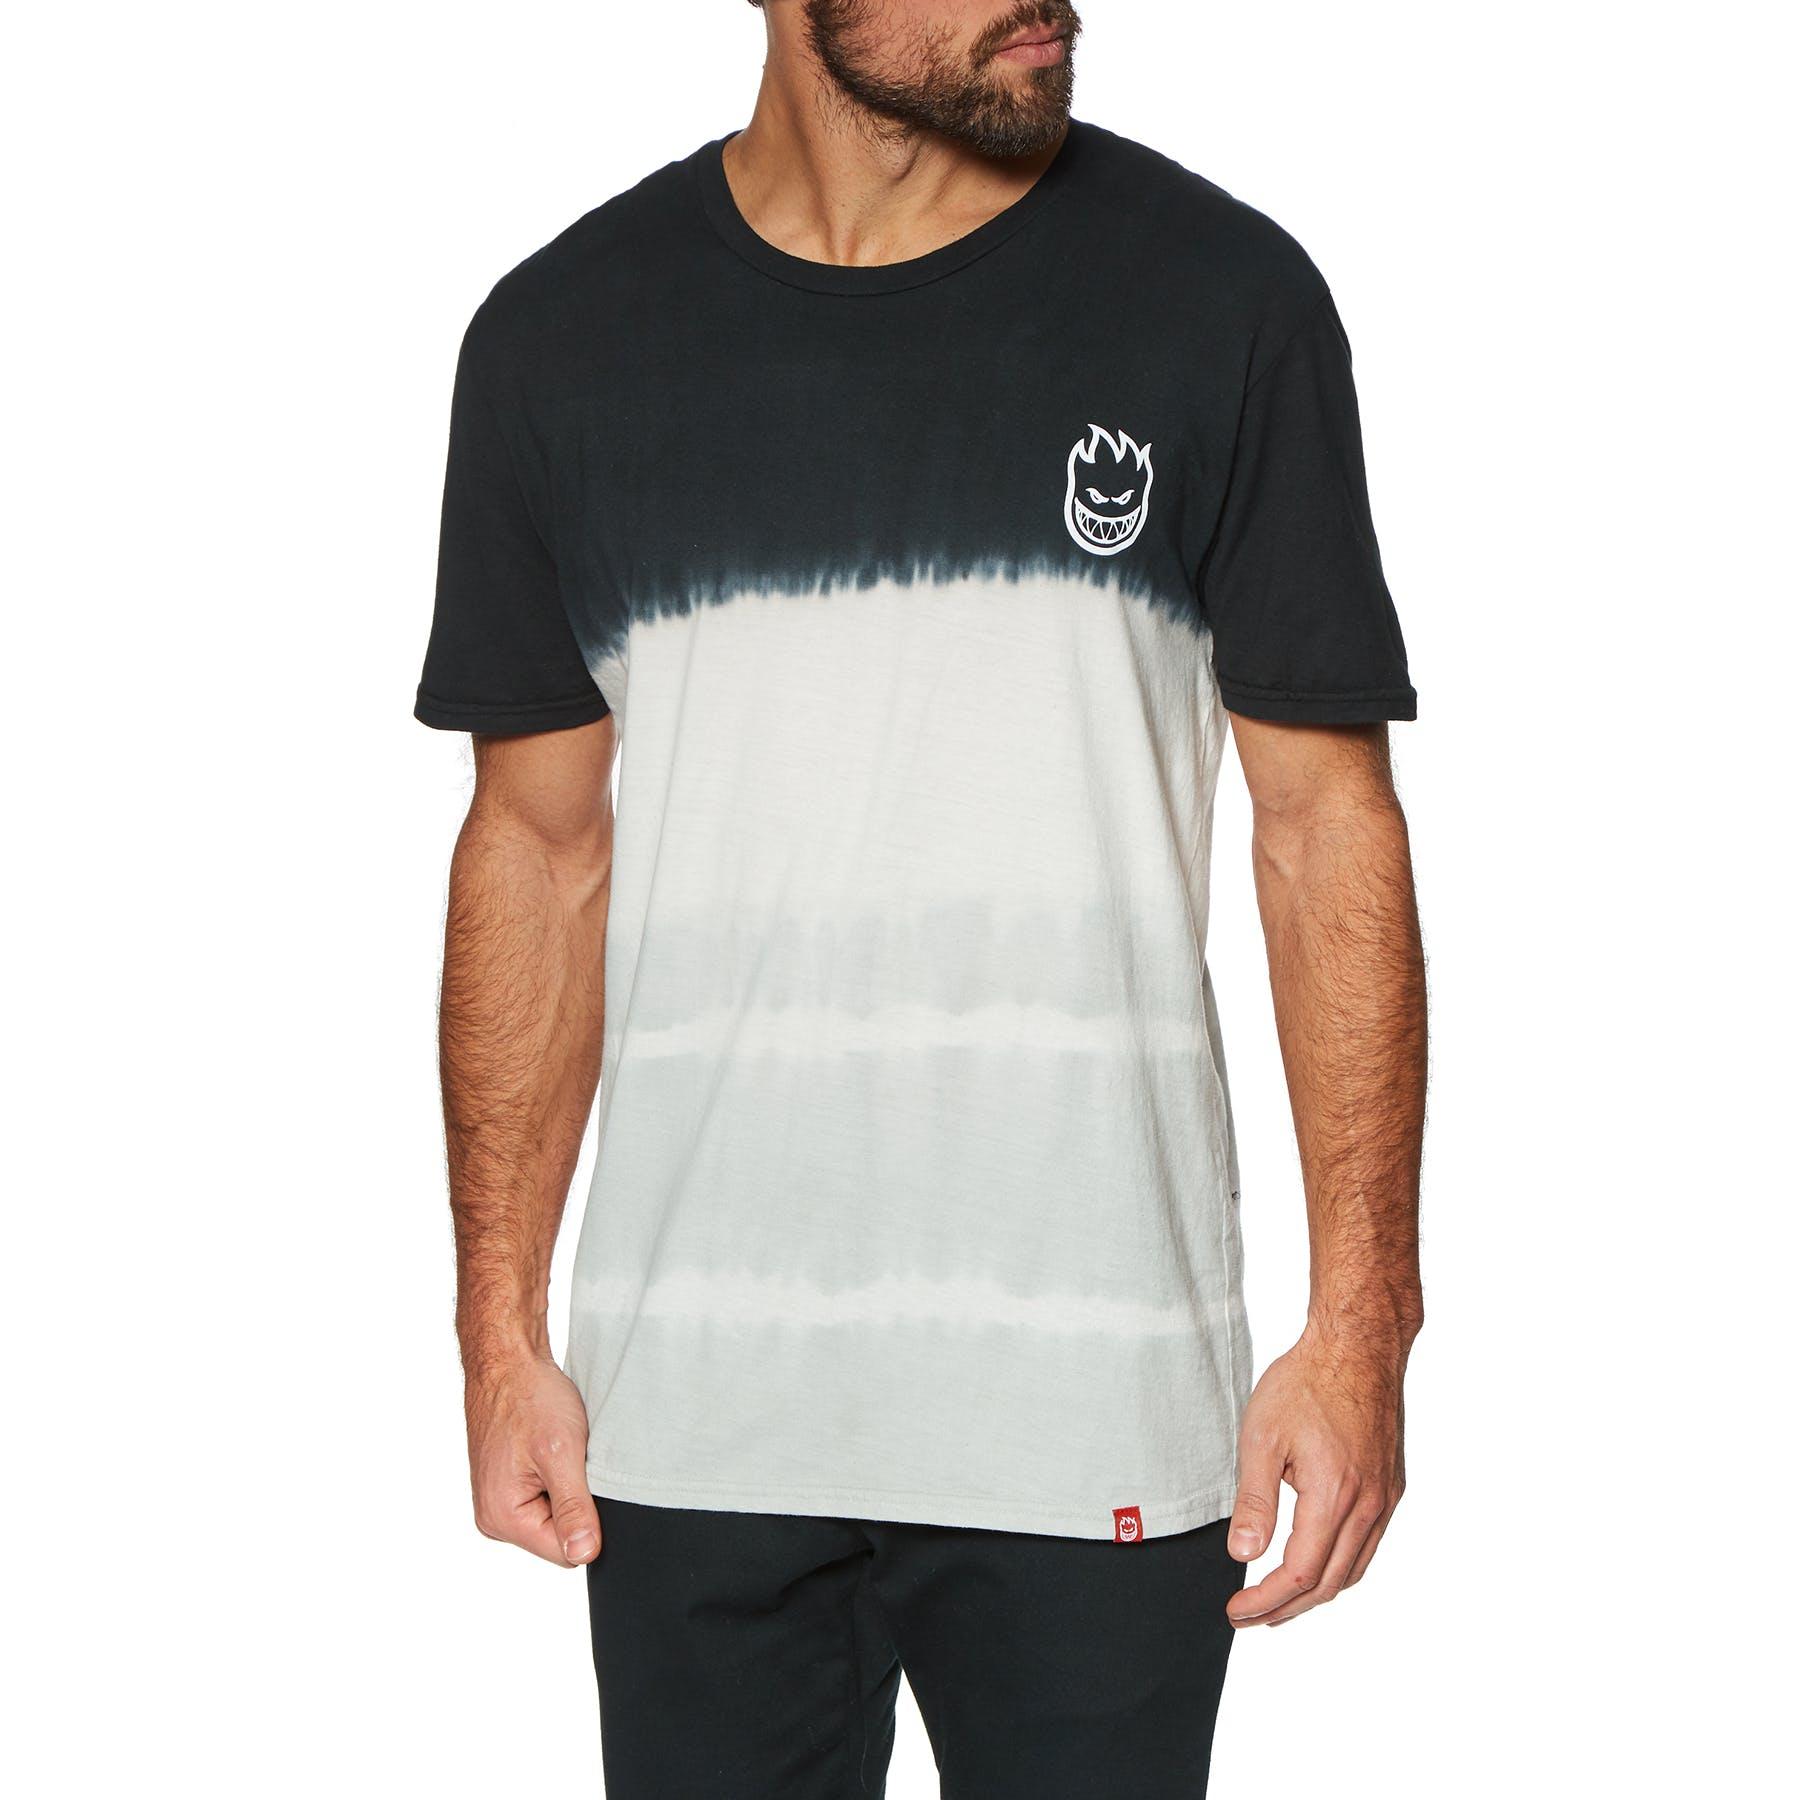 Element Horizontal Fill Short Sleeve T-Shirt in Flint Black